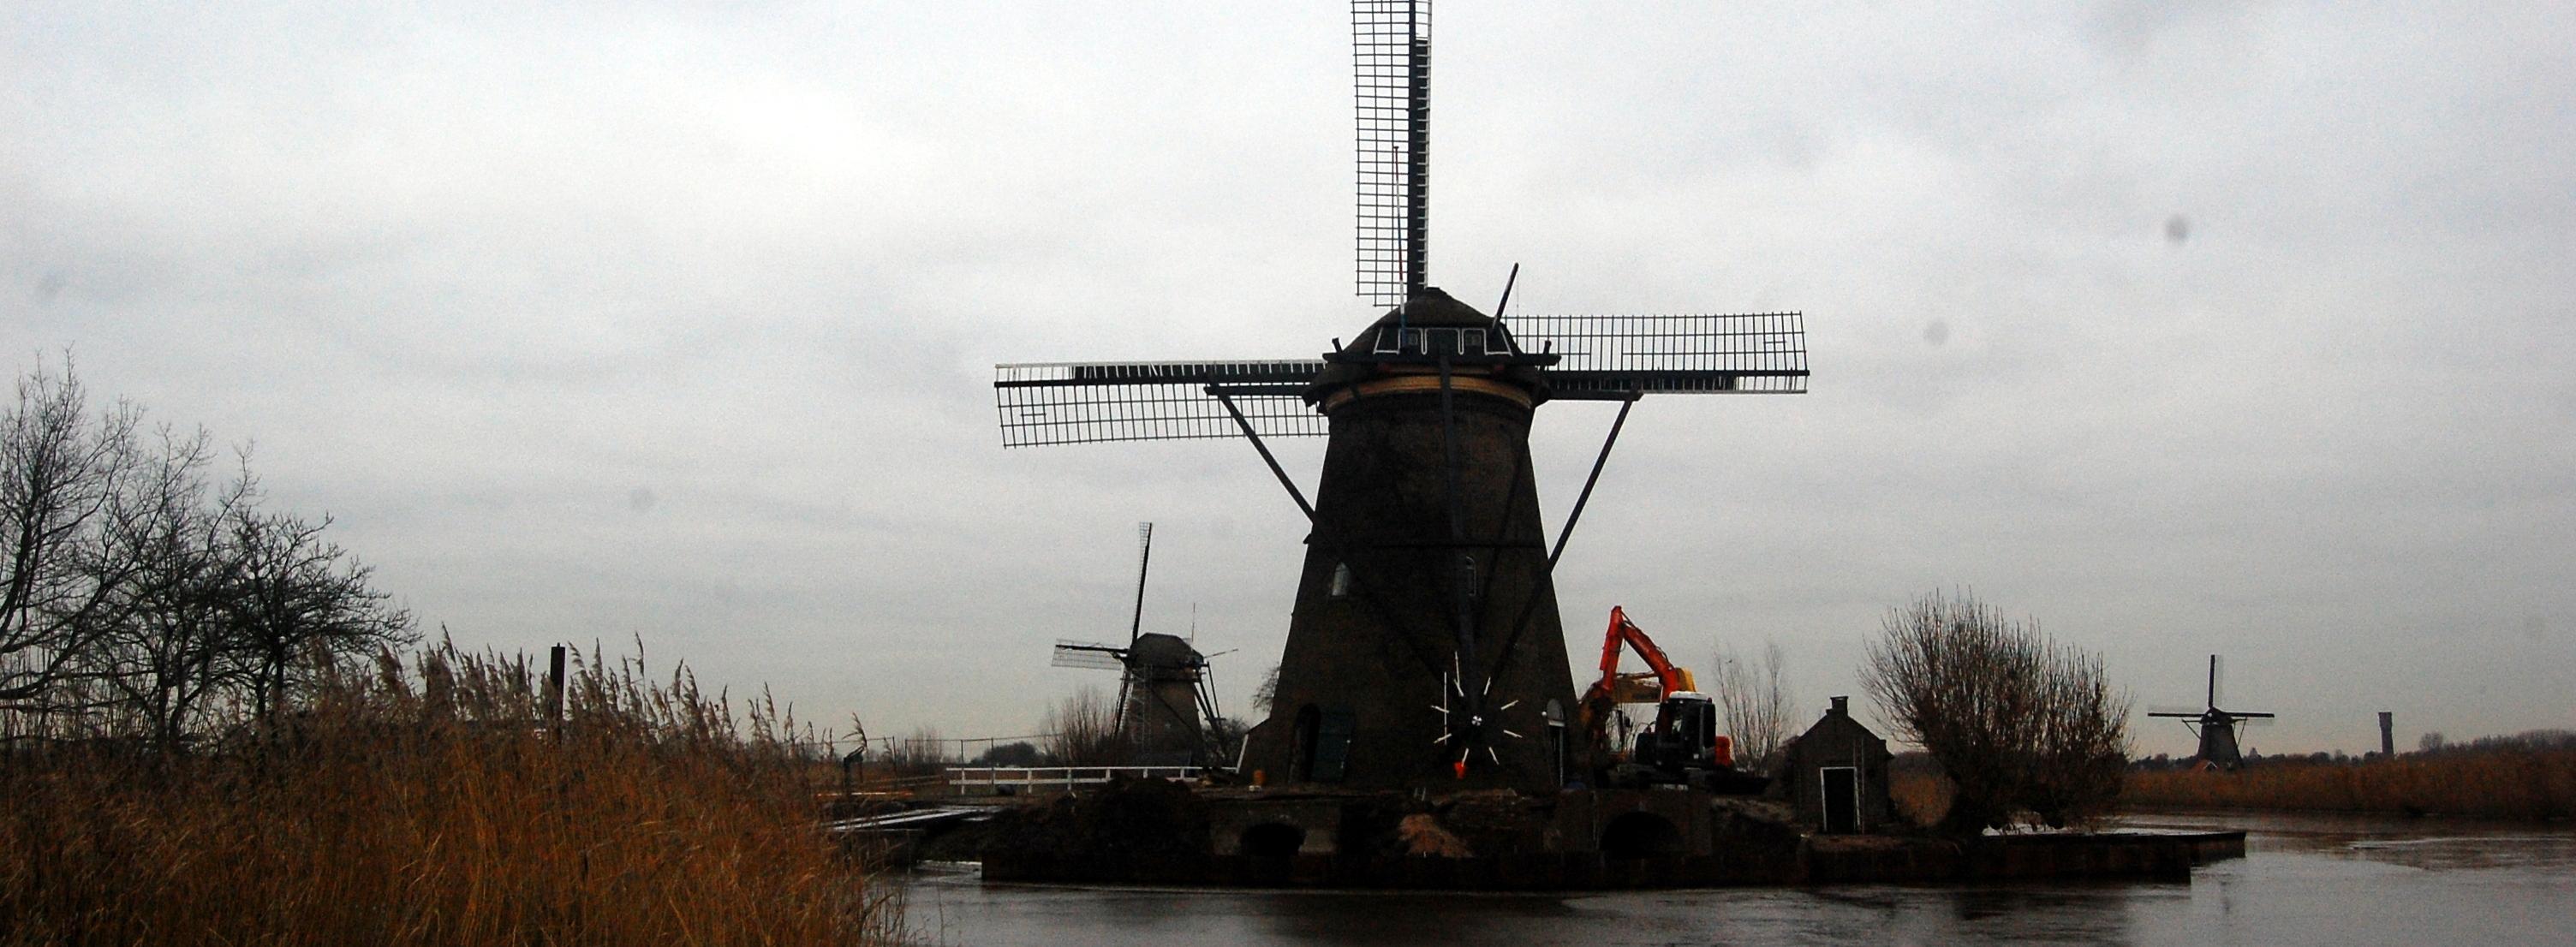 Monumentale es Kinderdijk